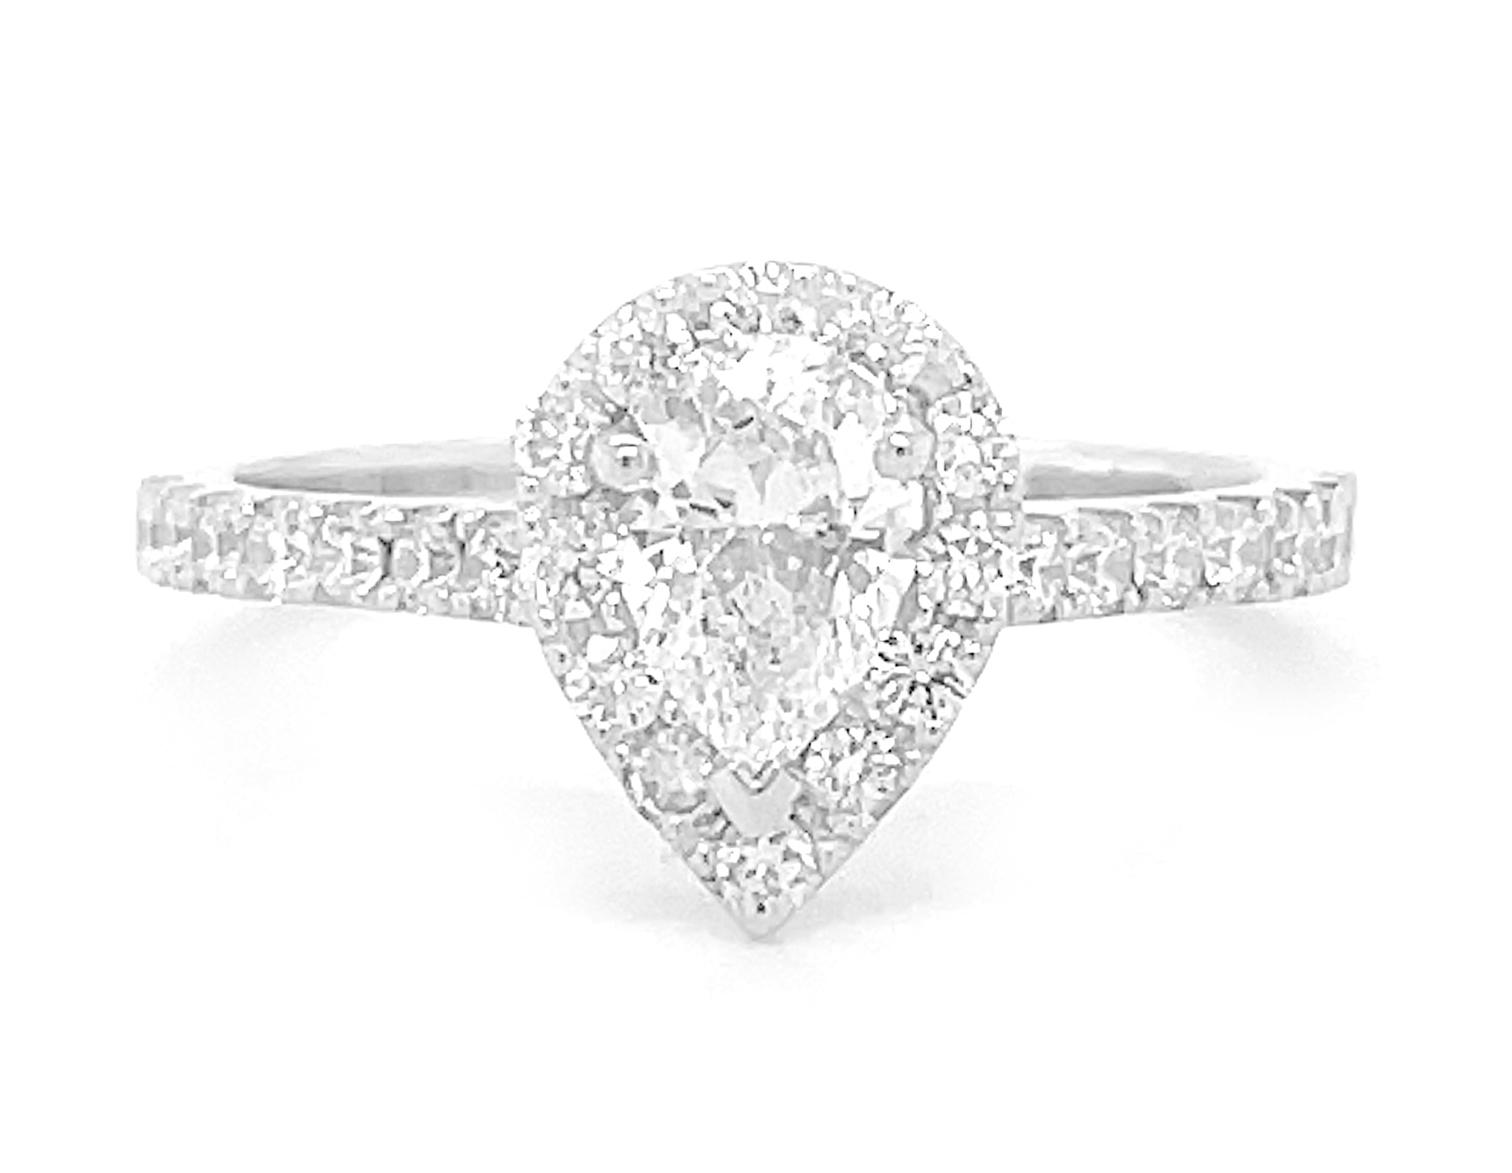 Pearshape Diamond Cluster Ring